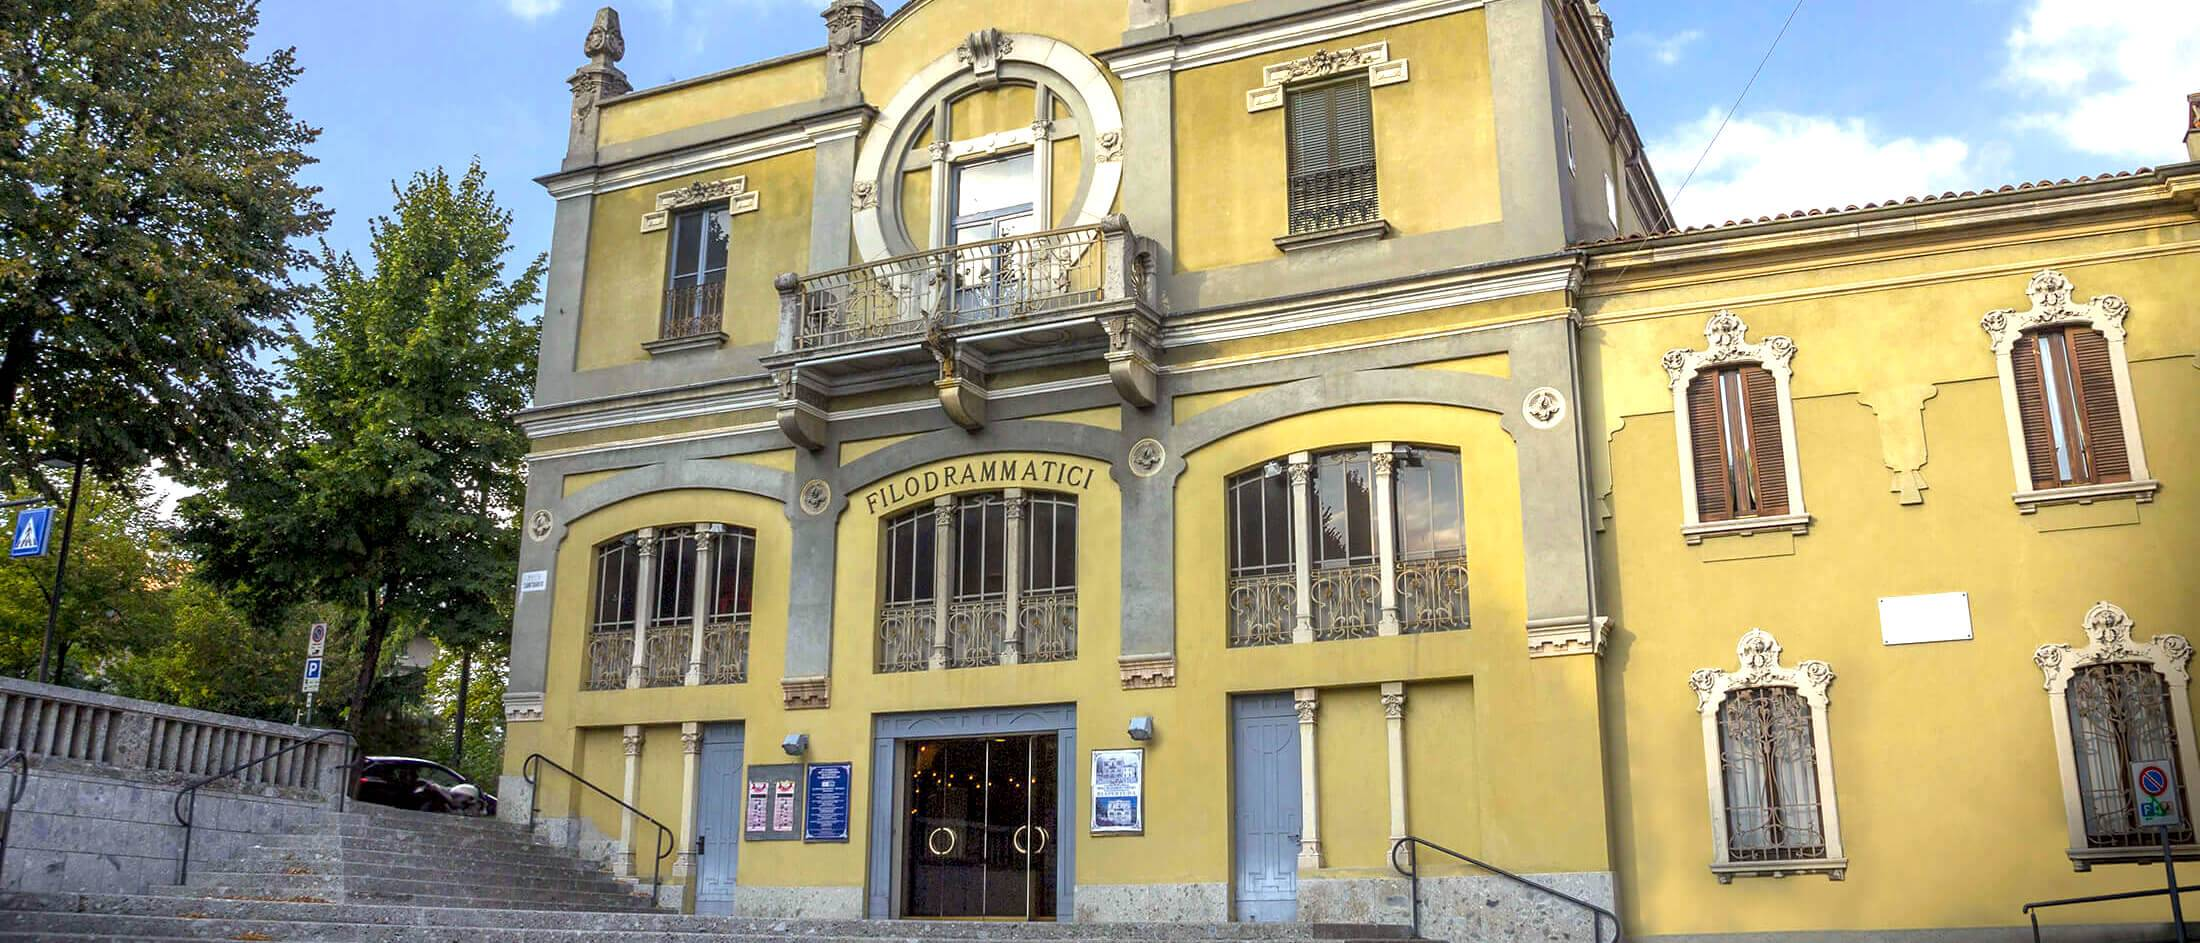 Teatro_filodrammatici_Treviglio-web